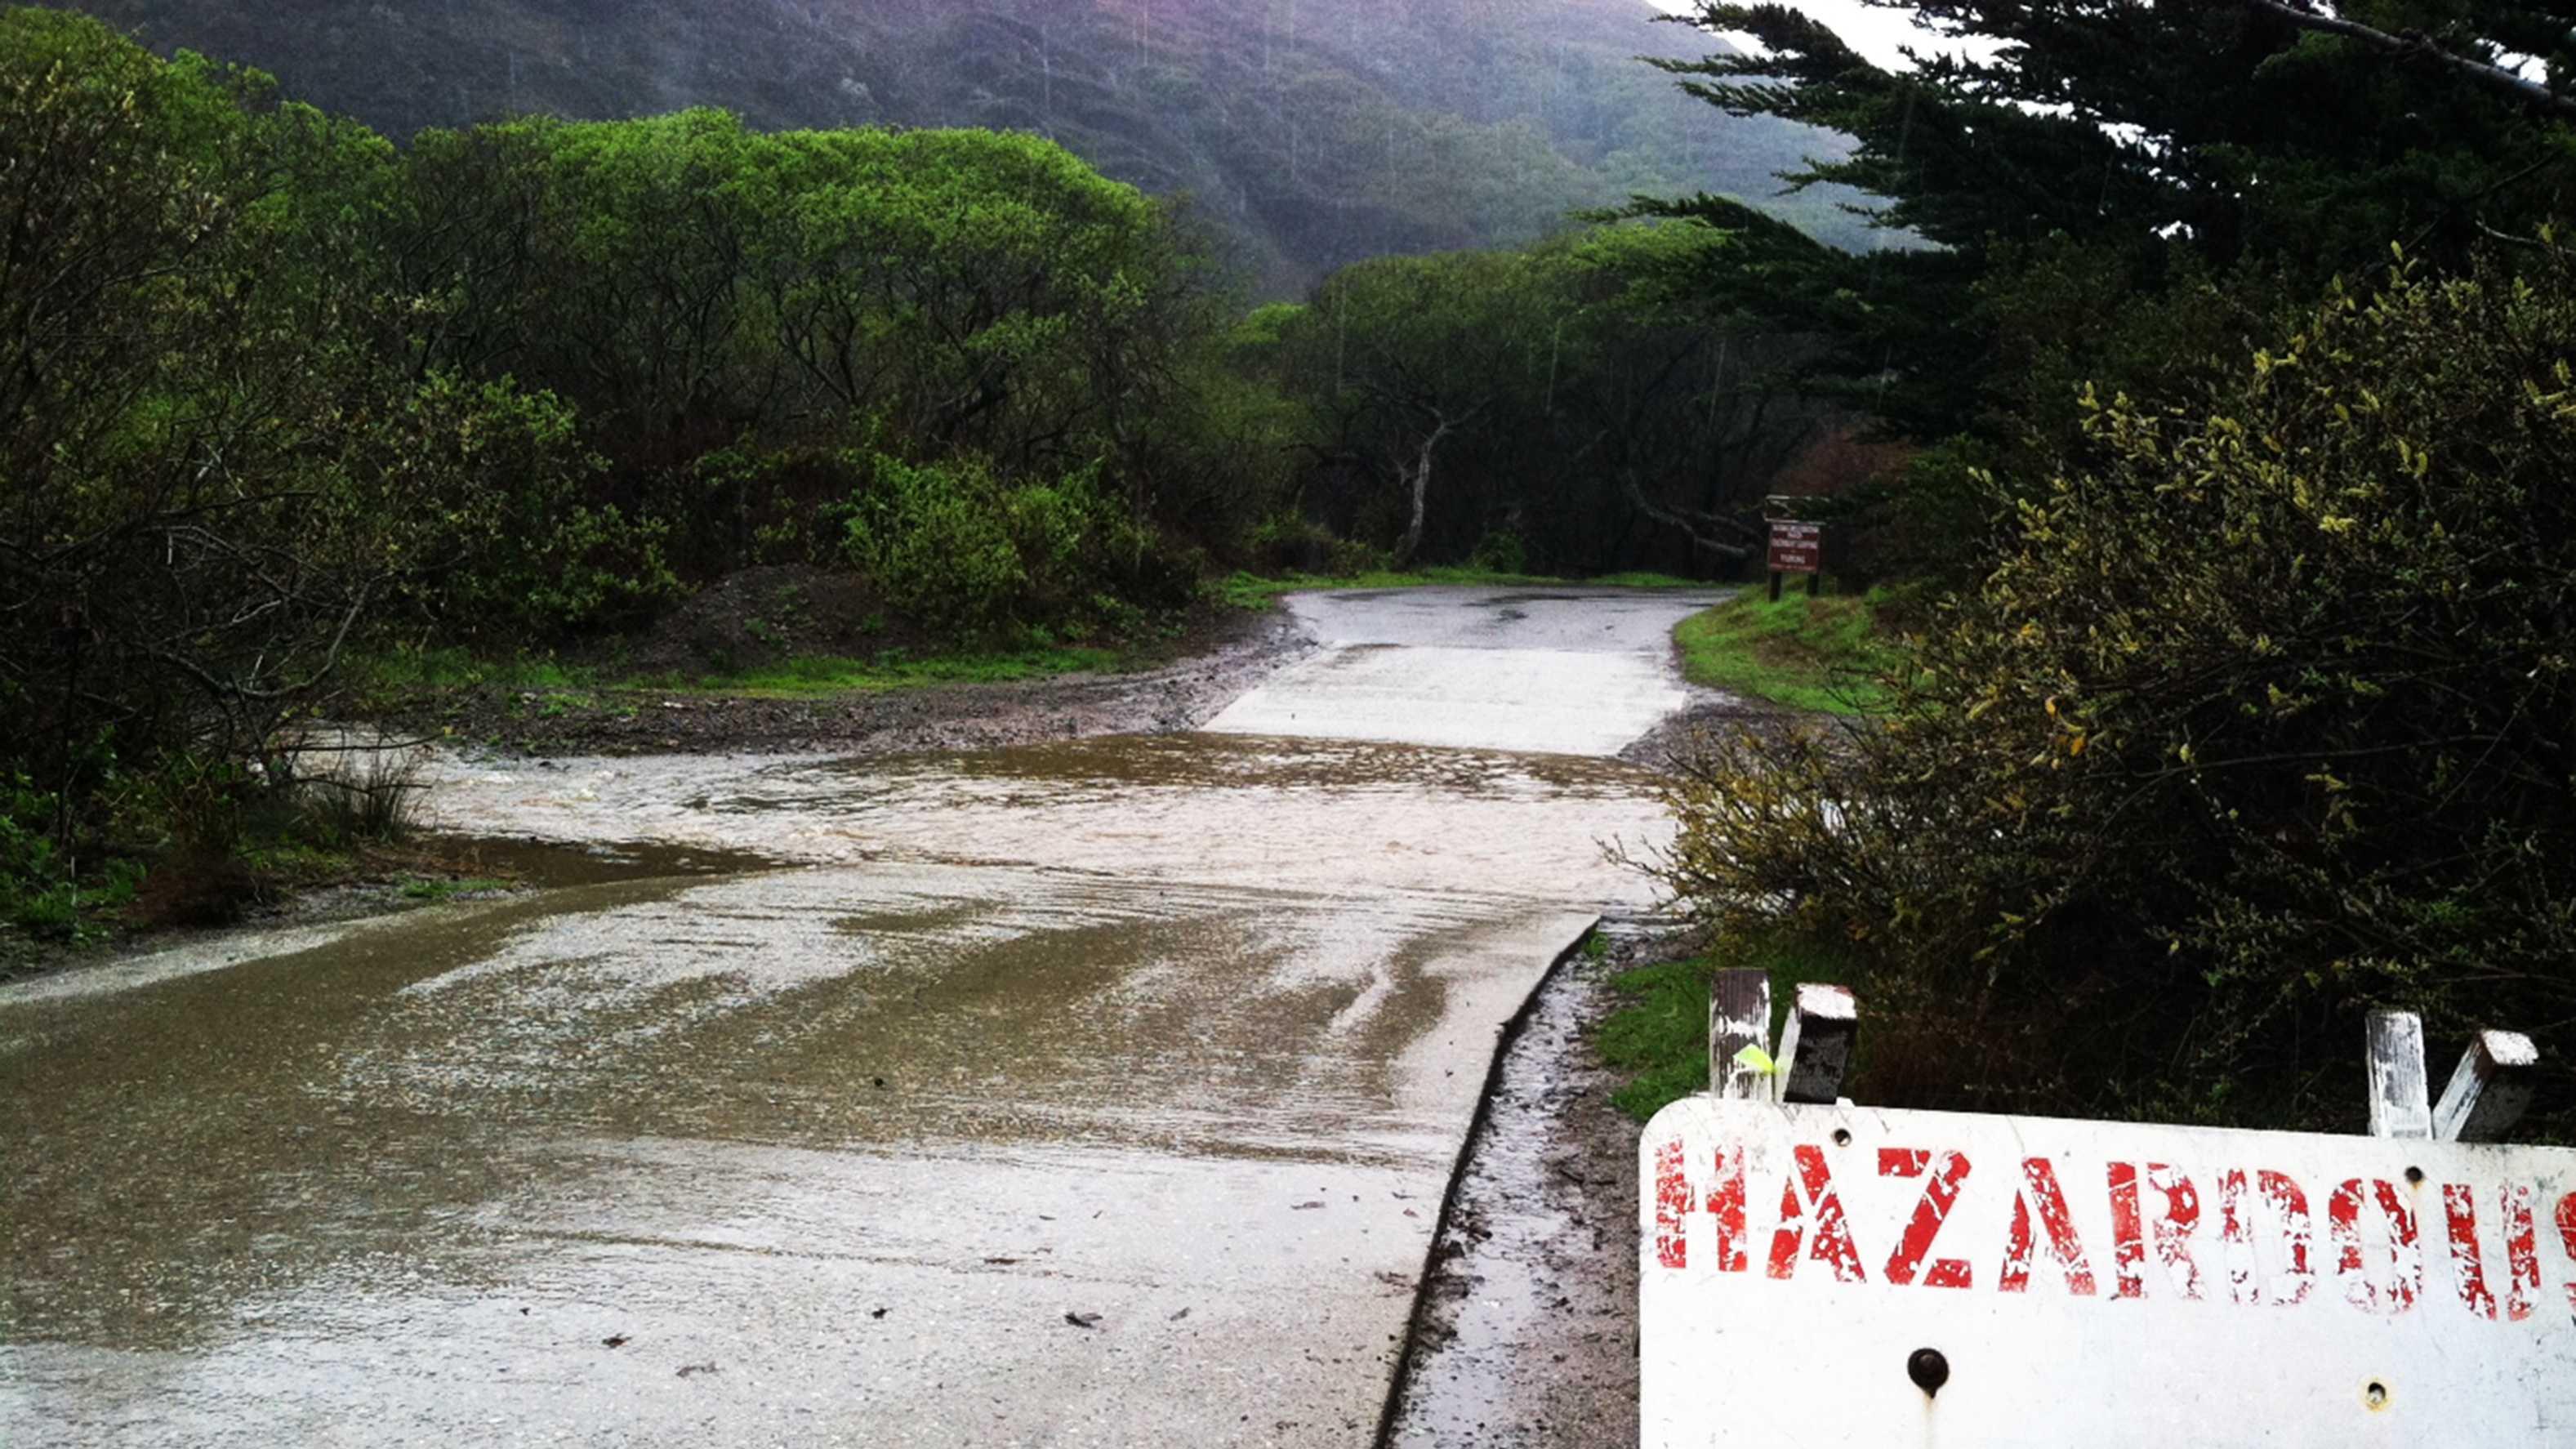 Sycamore Canyon Road